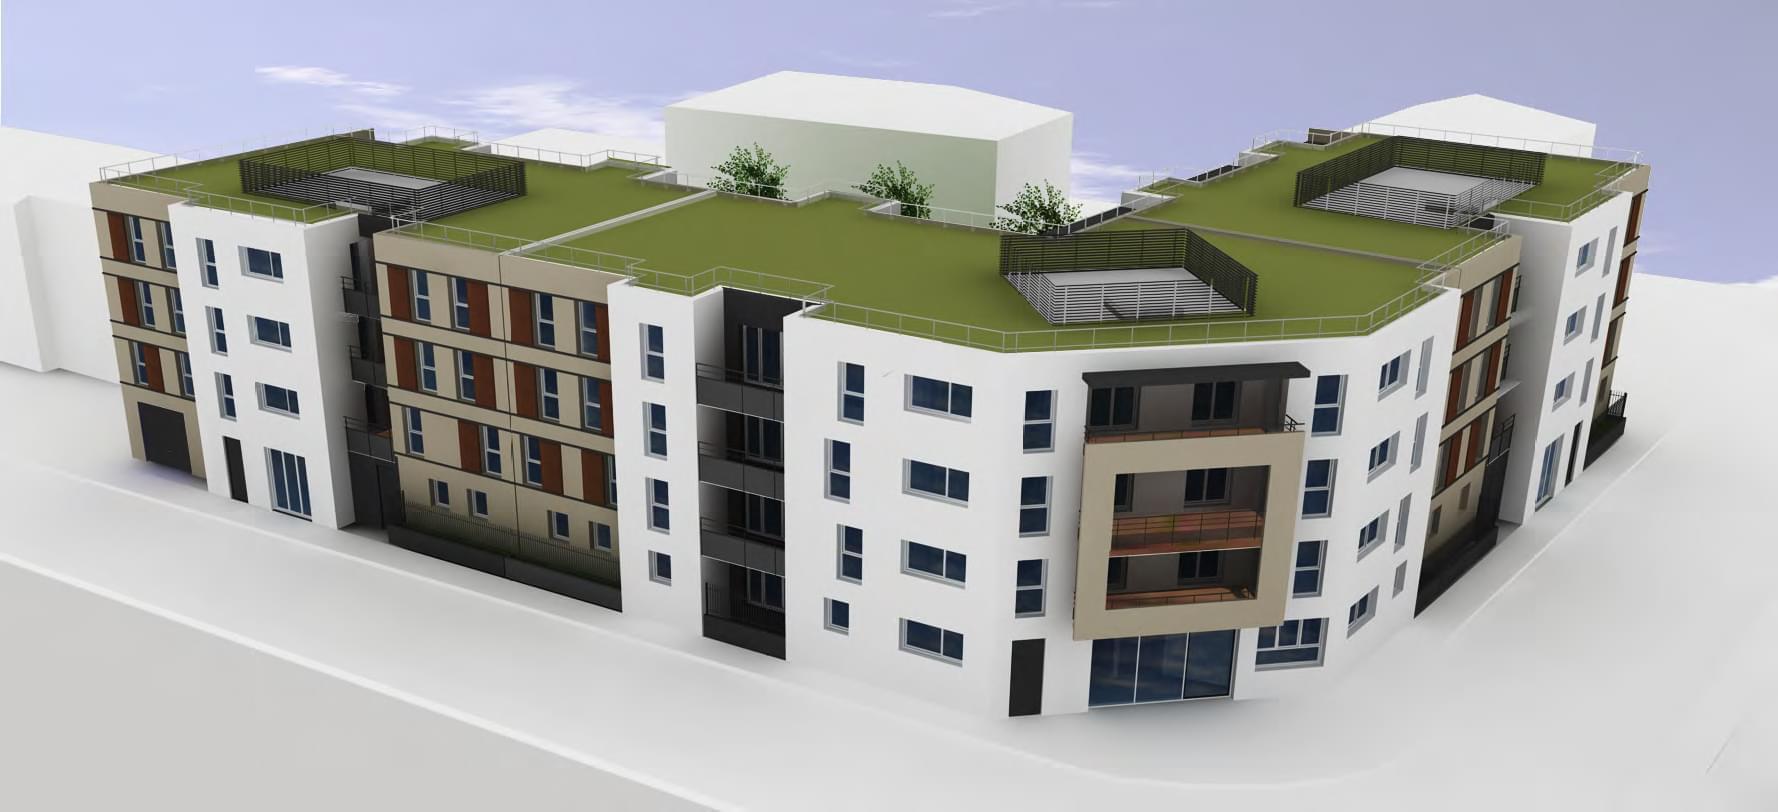 Logement neuf pour investir lyon 8 moulin vent c t for Investir appartement neuf